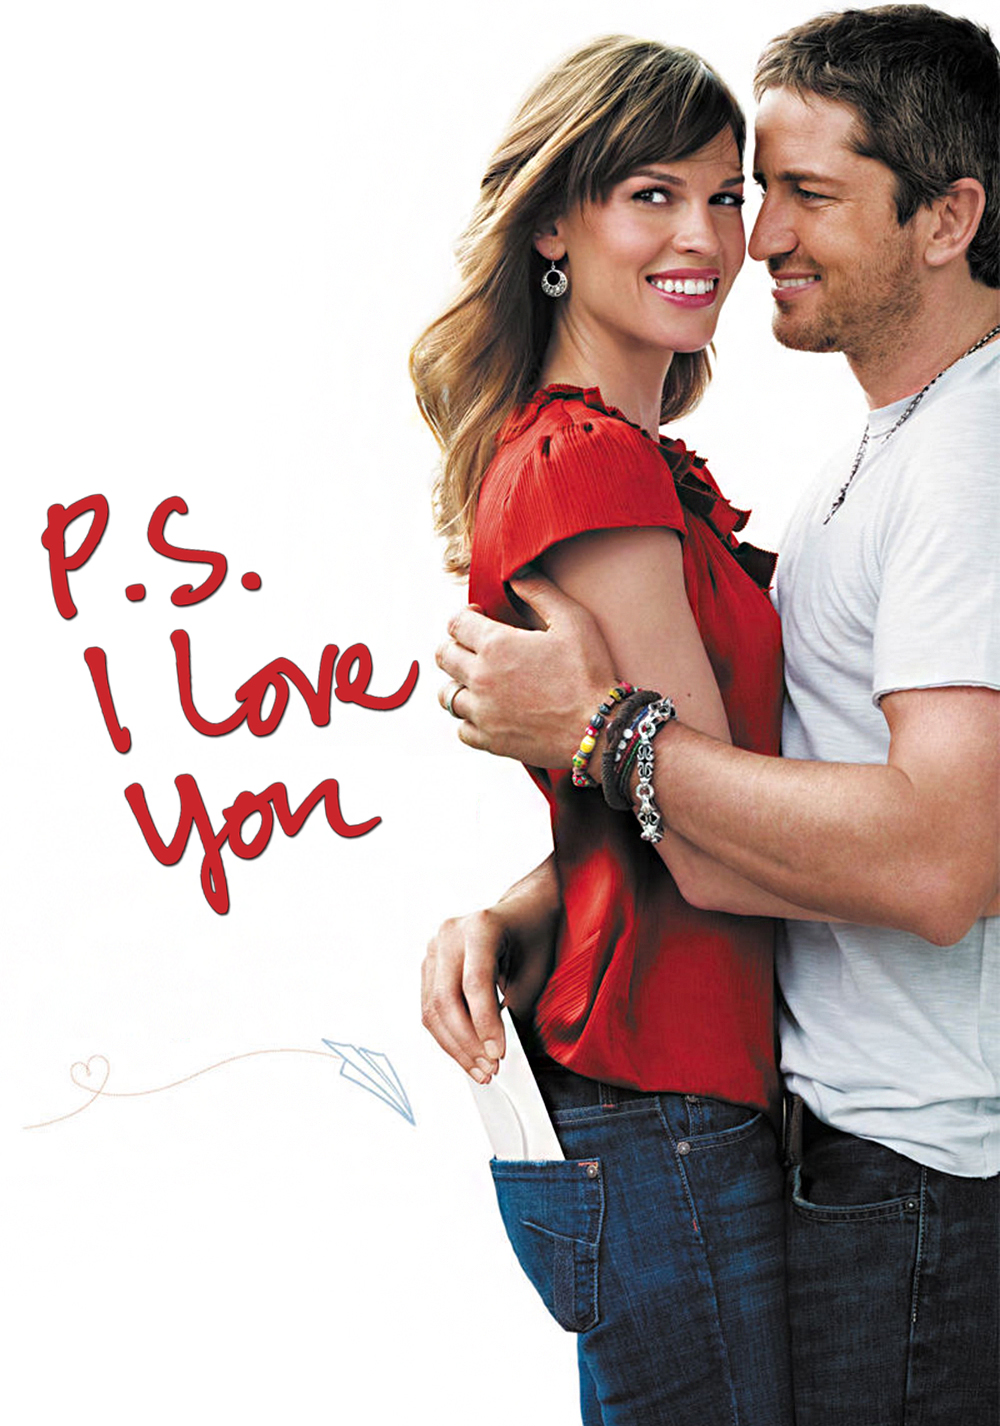 P.S. I Love You | Movie fanart | fanart.tv